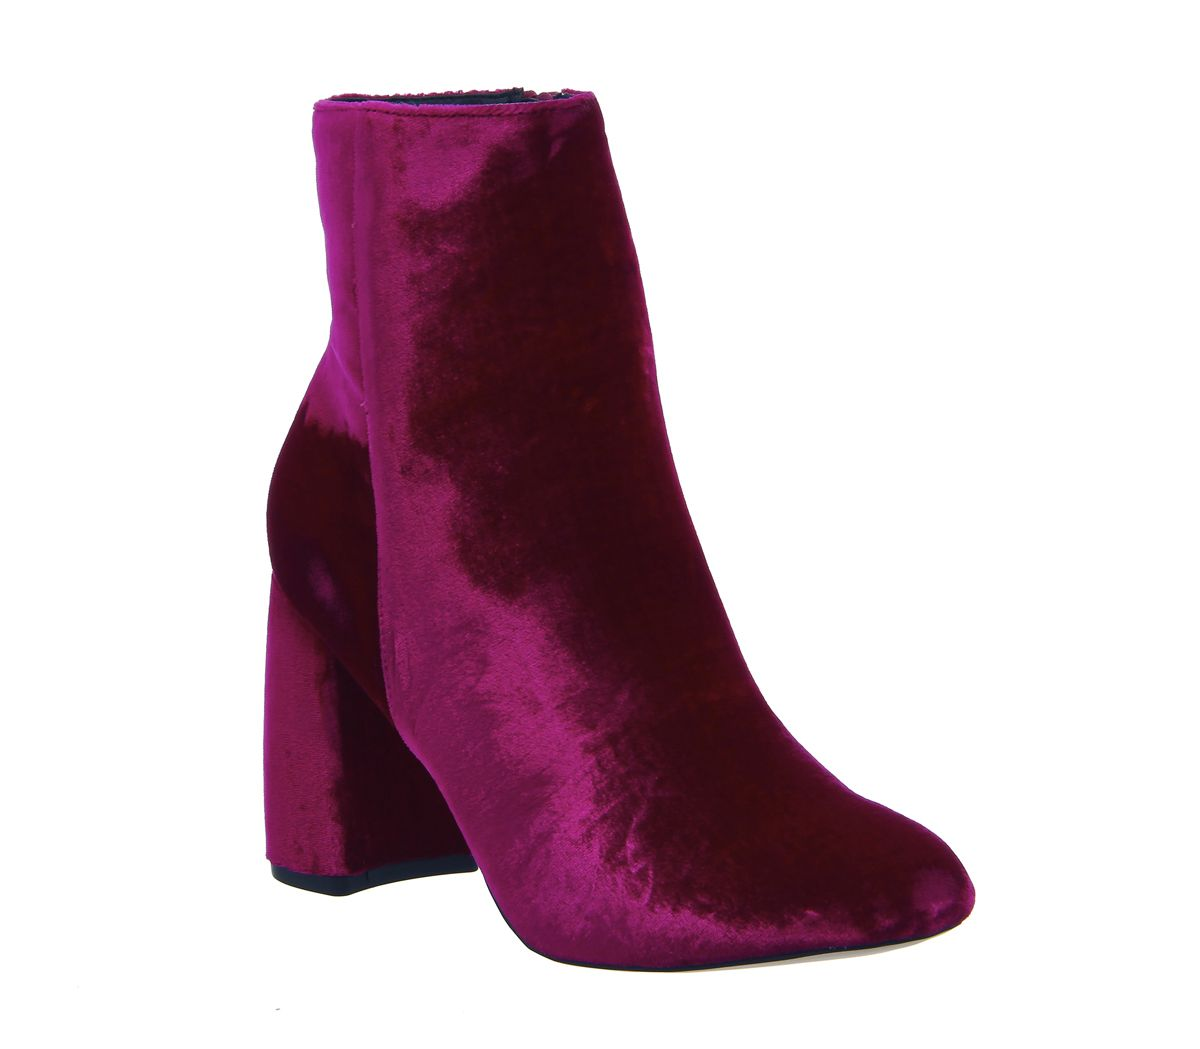 571870e4f9d7 Office Literally High Cut Boots Pink Velvet - Ankle Boots